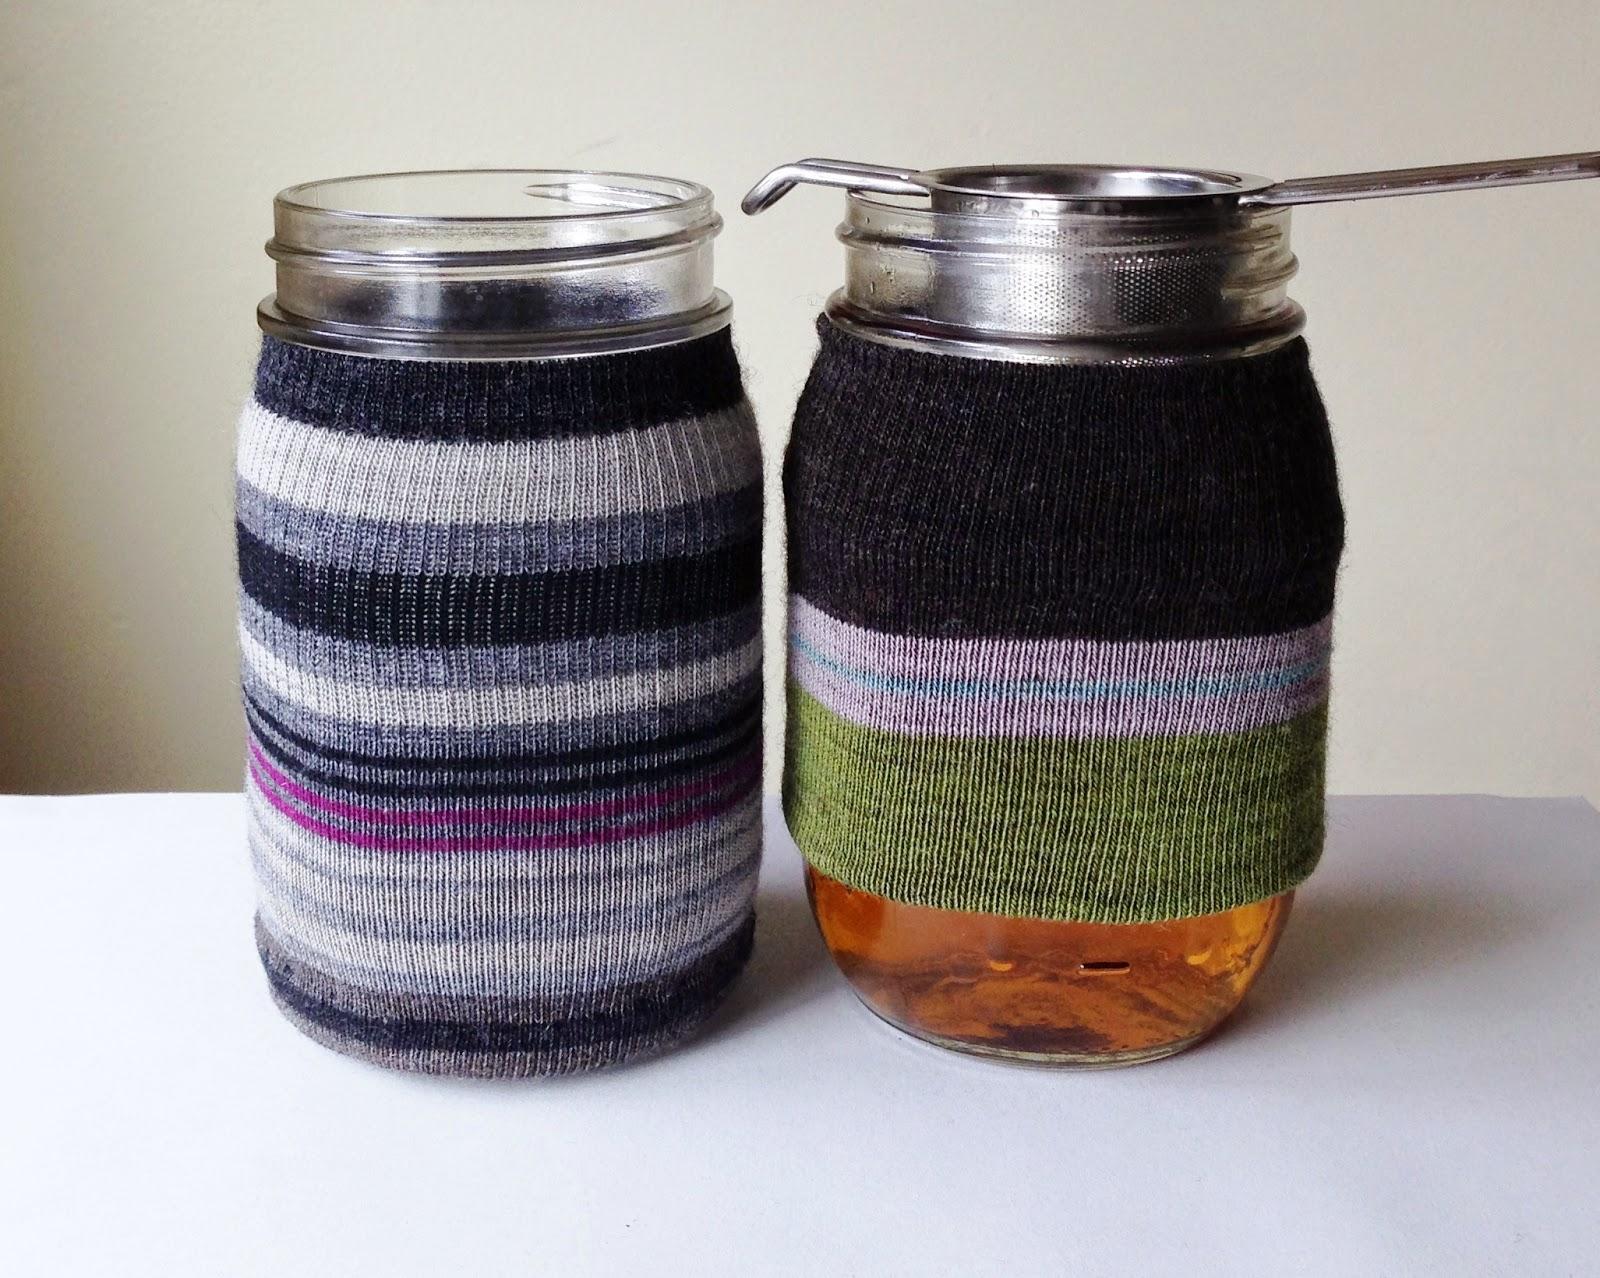 http://webloomhere.blogspot.com/2014/12/another-mason-jar-cozy-tutorial.html